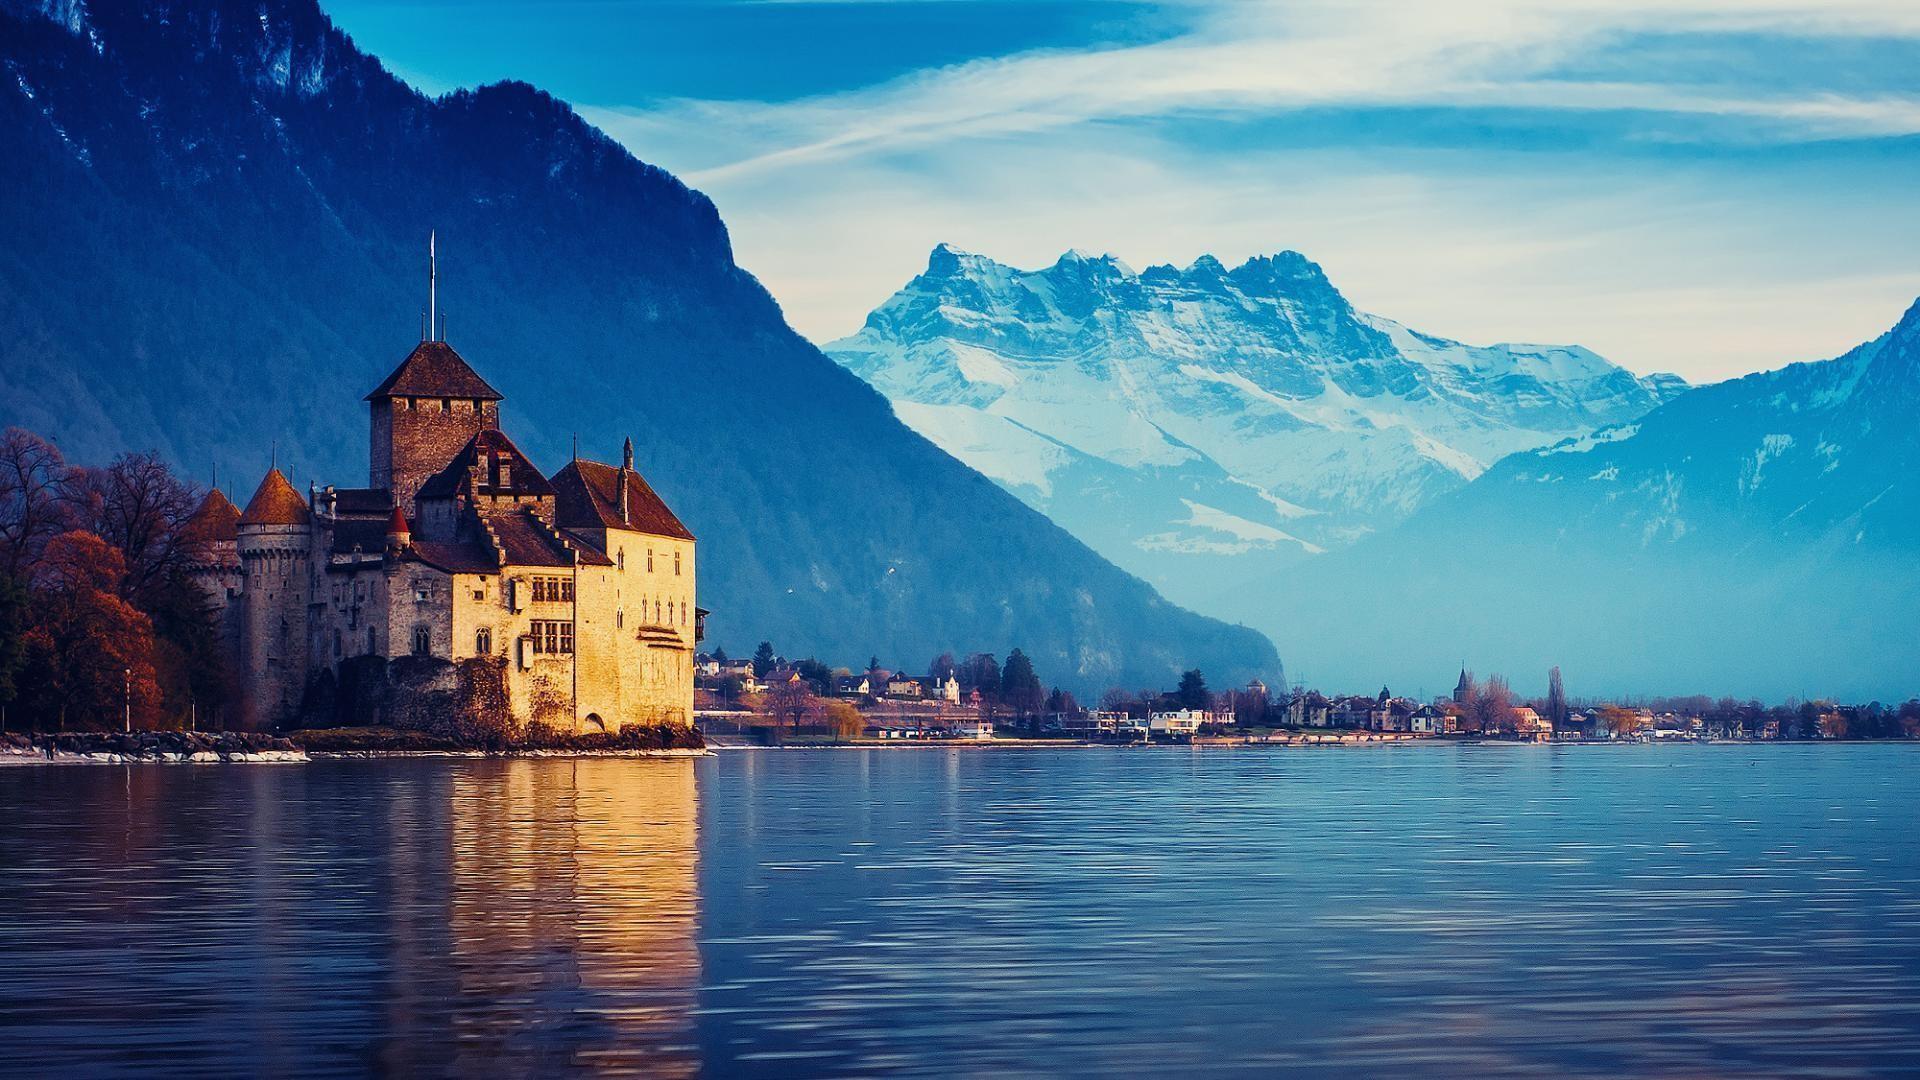 hd landscape wallpapers 1080p – 1920×1080 Download Free Wallpaper .